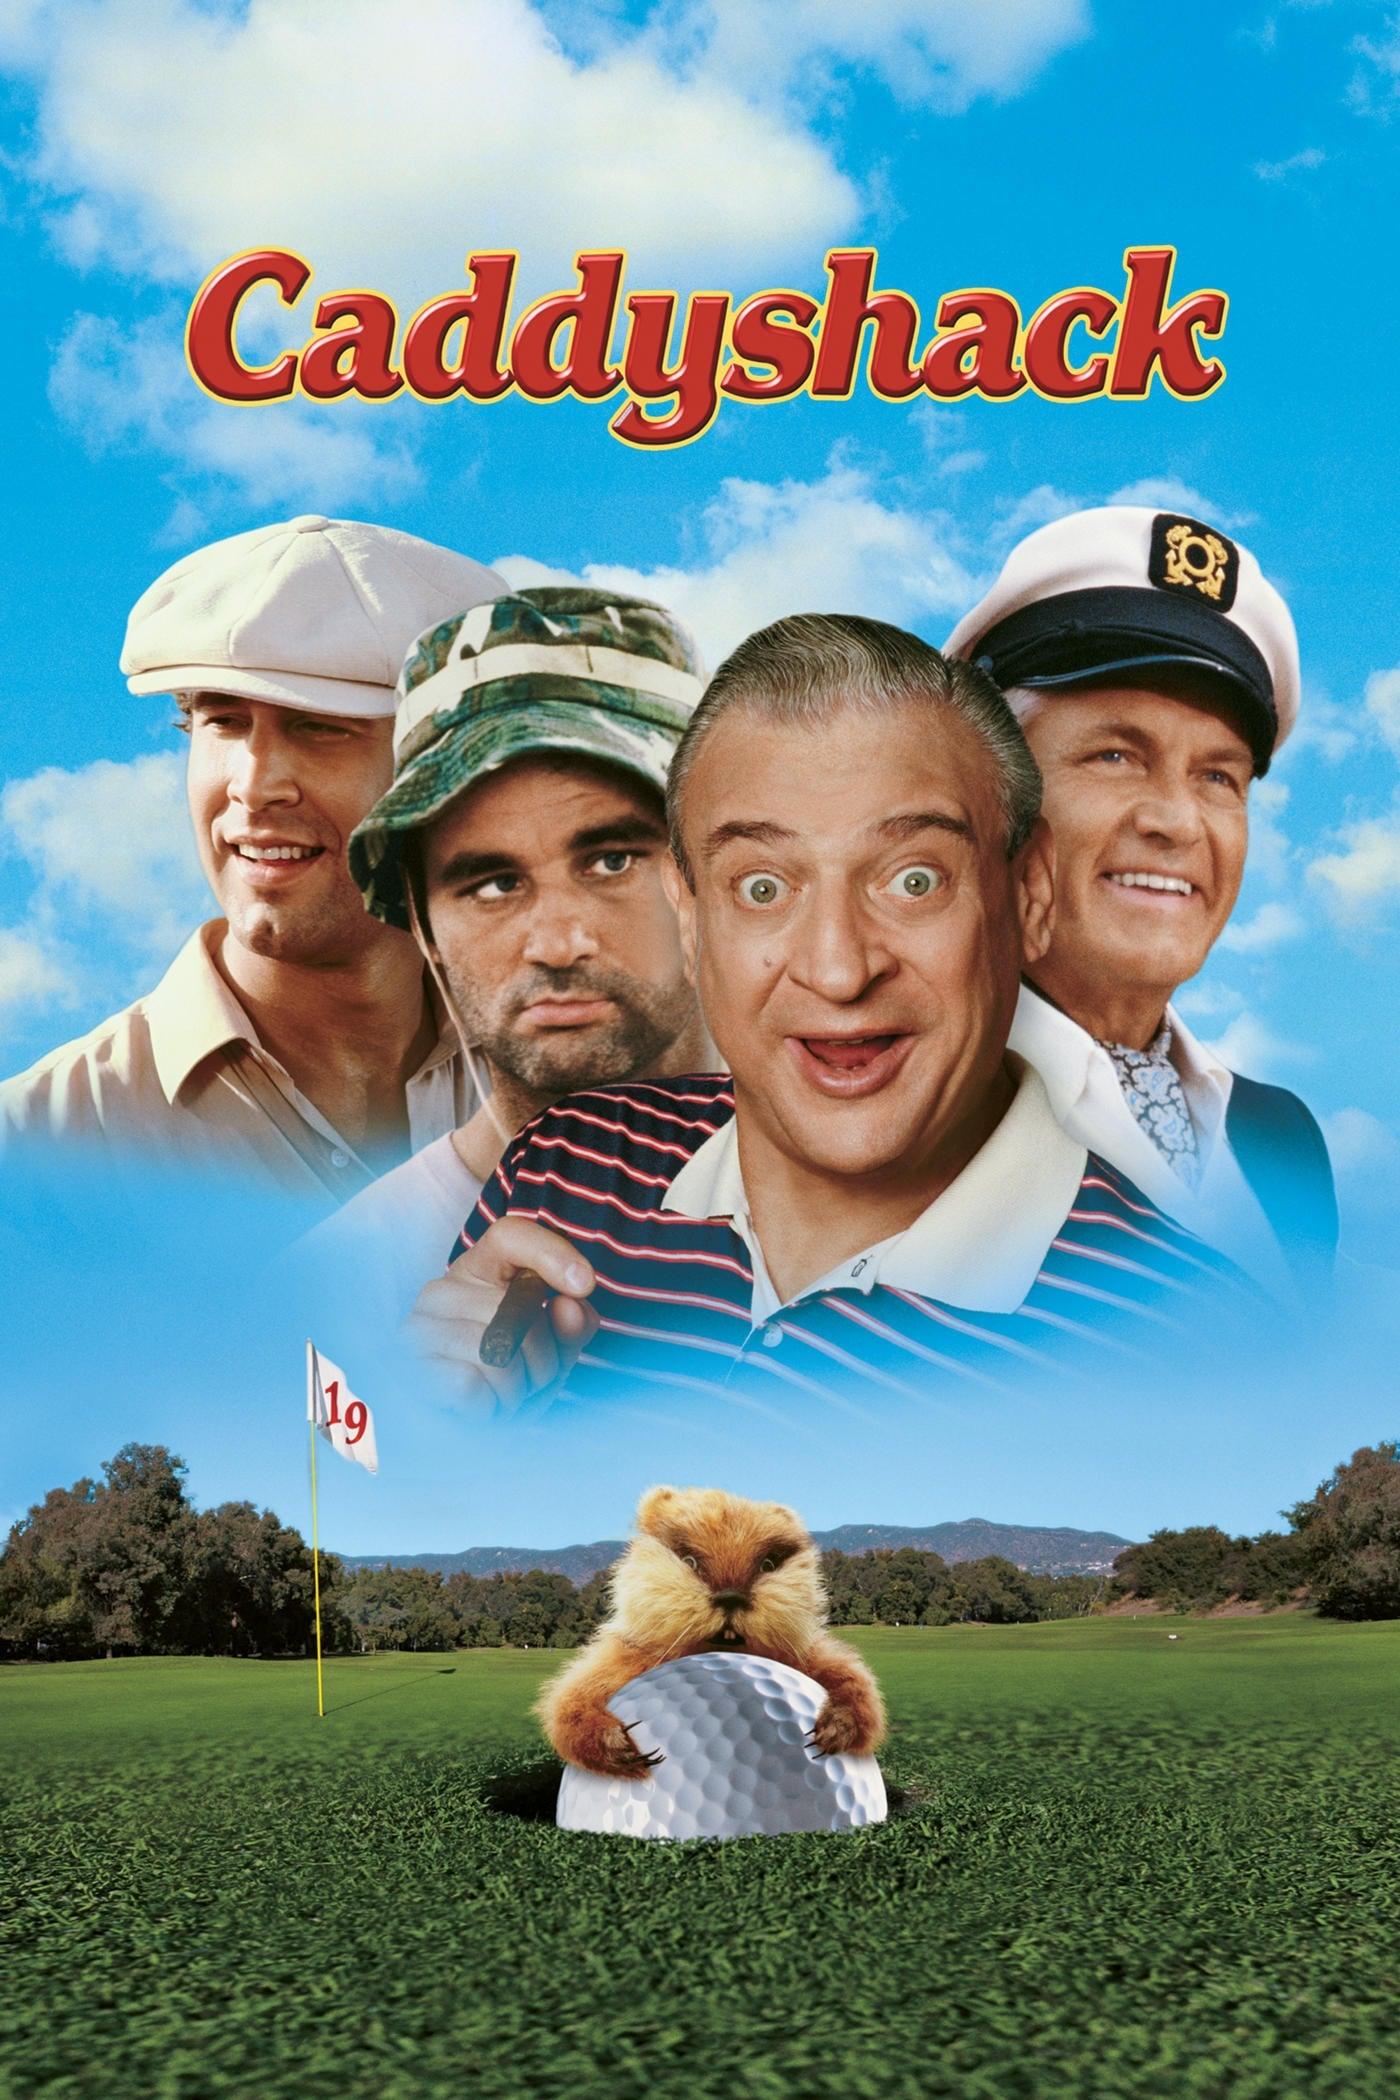 Caddyshack Clips